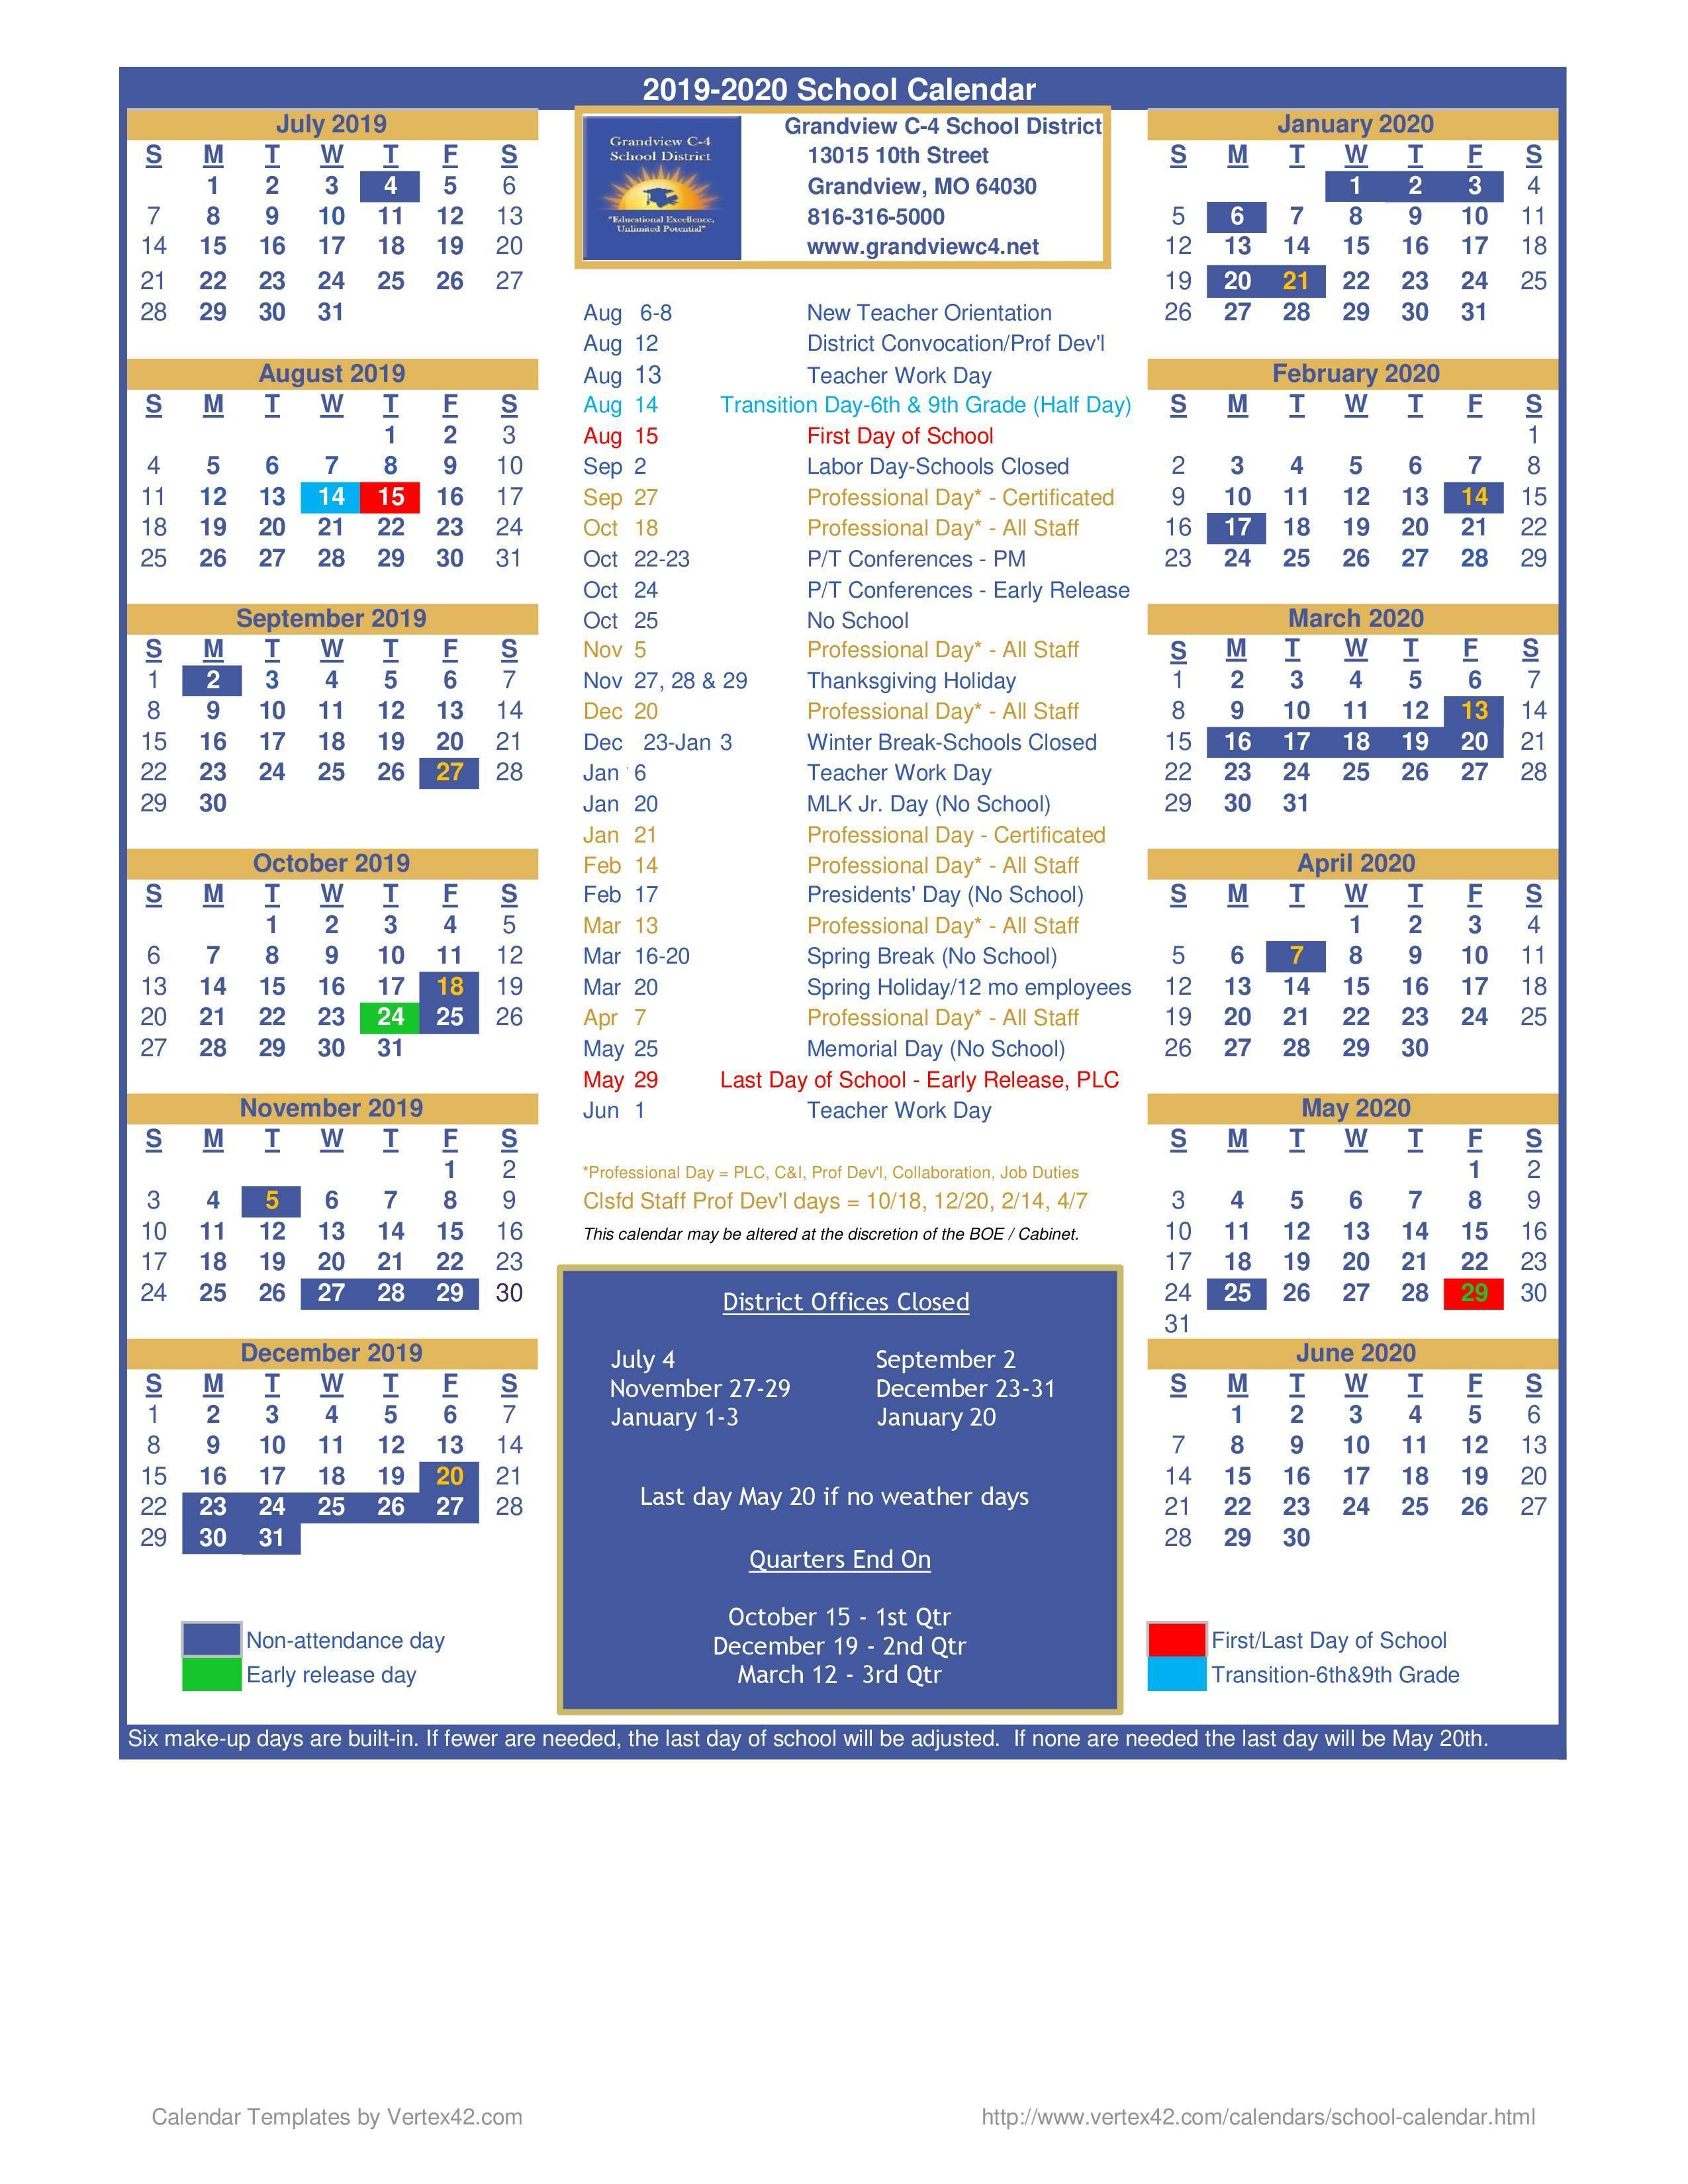 District Calendar – District Calendar – Grandview C-4 School